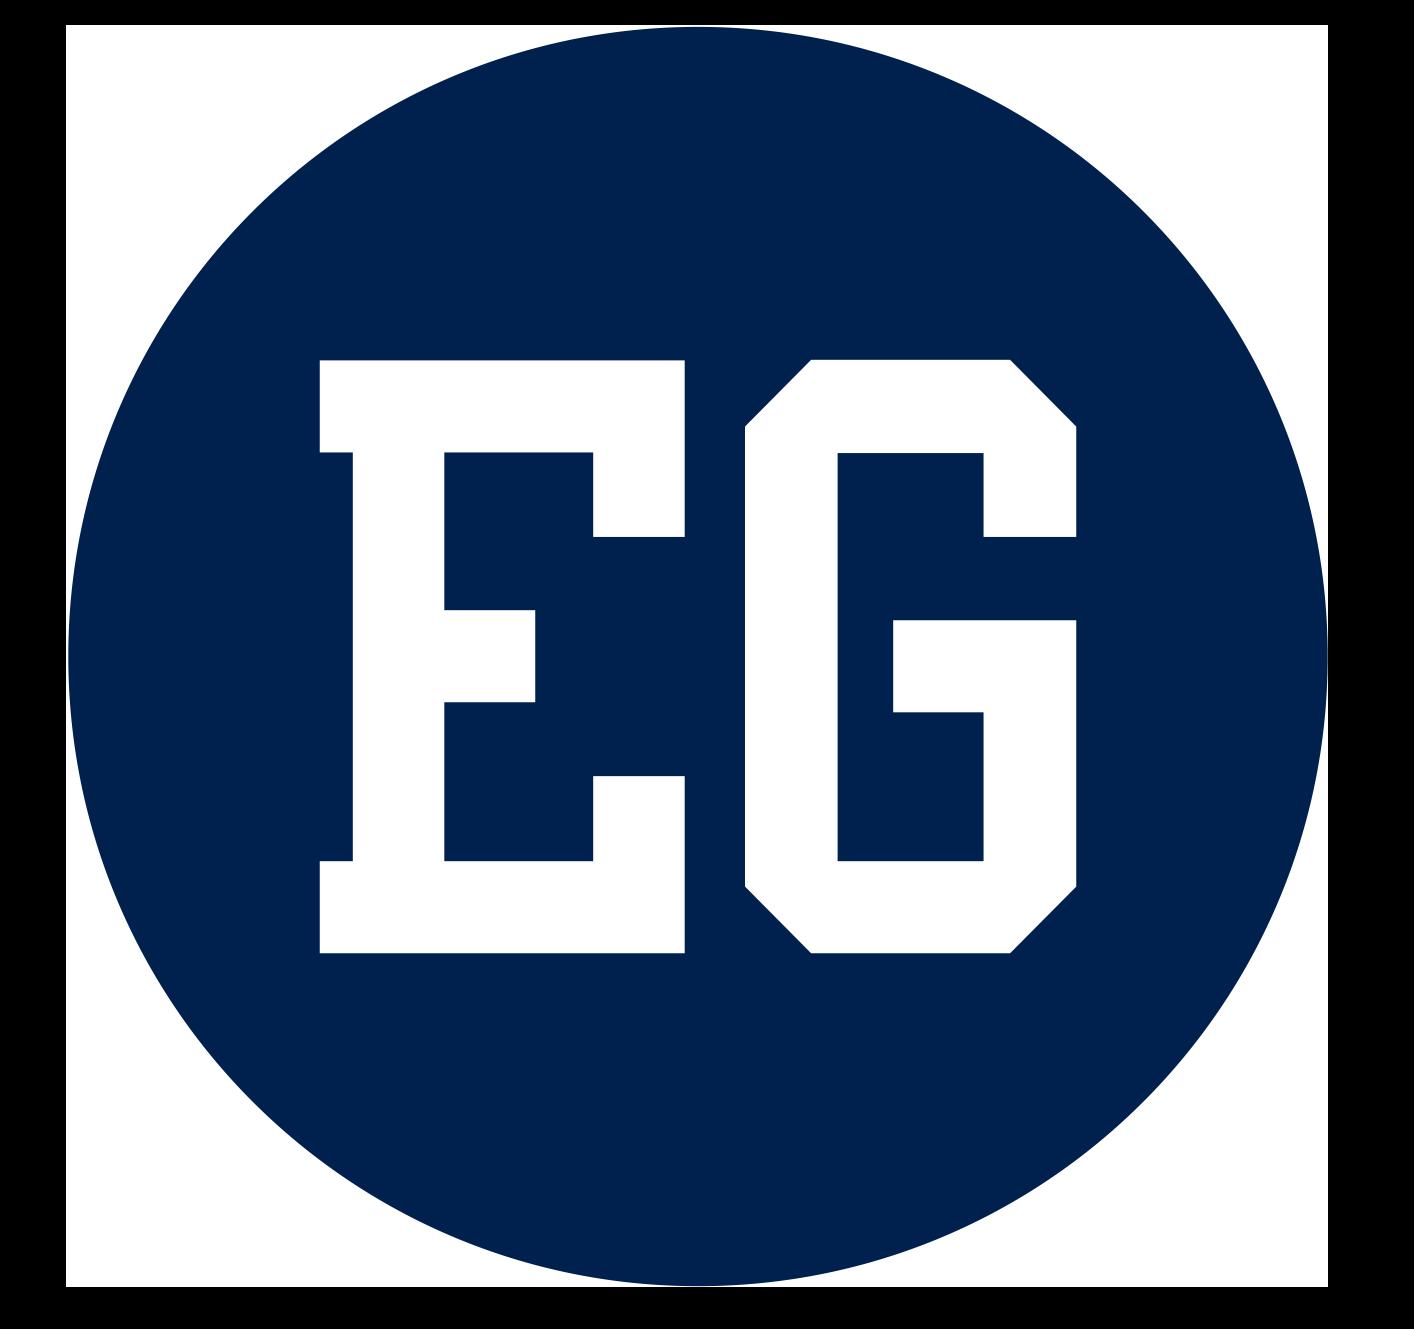 EGlogo.png